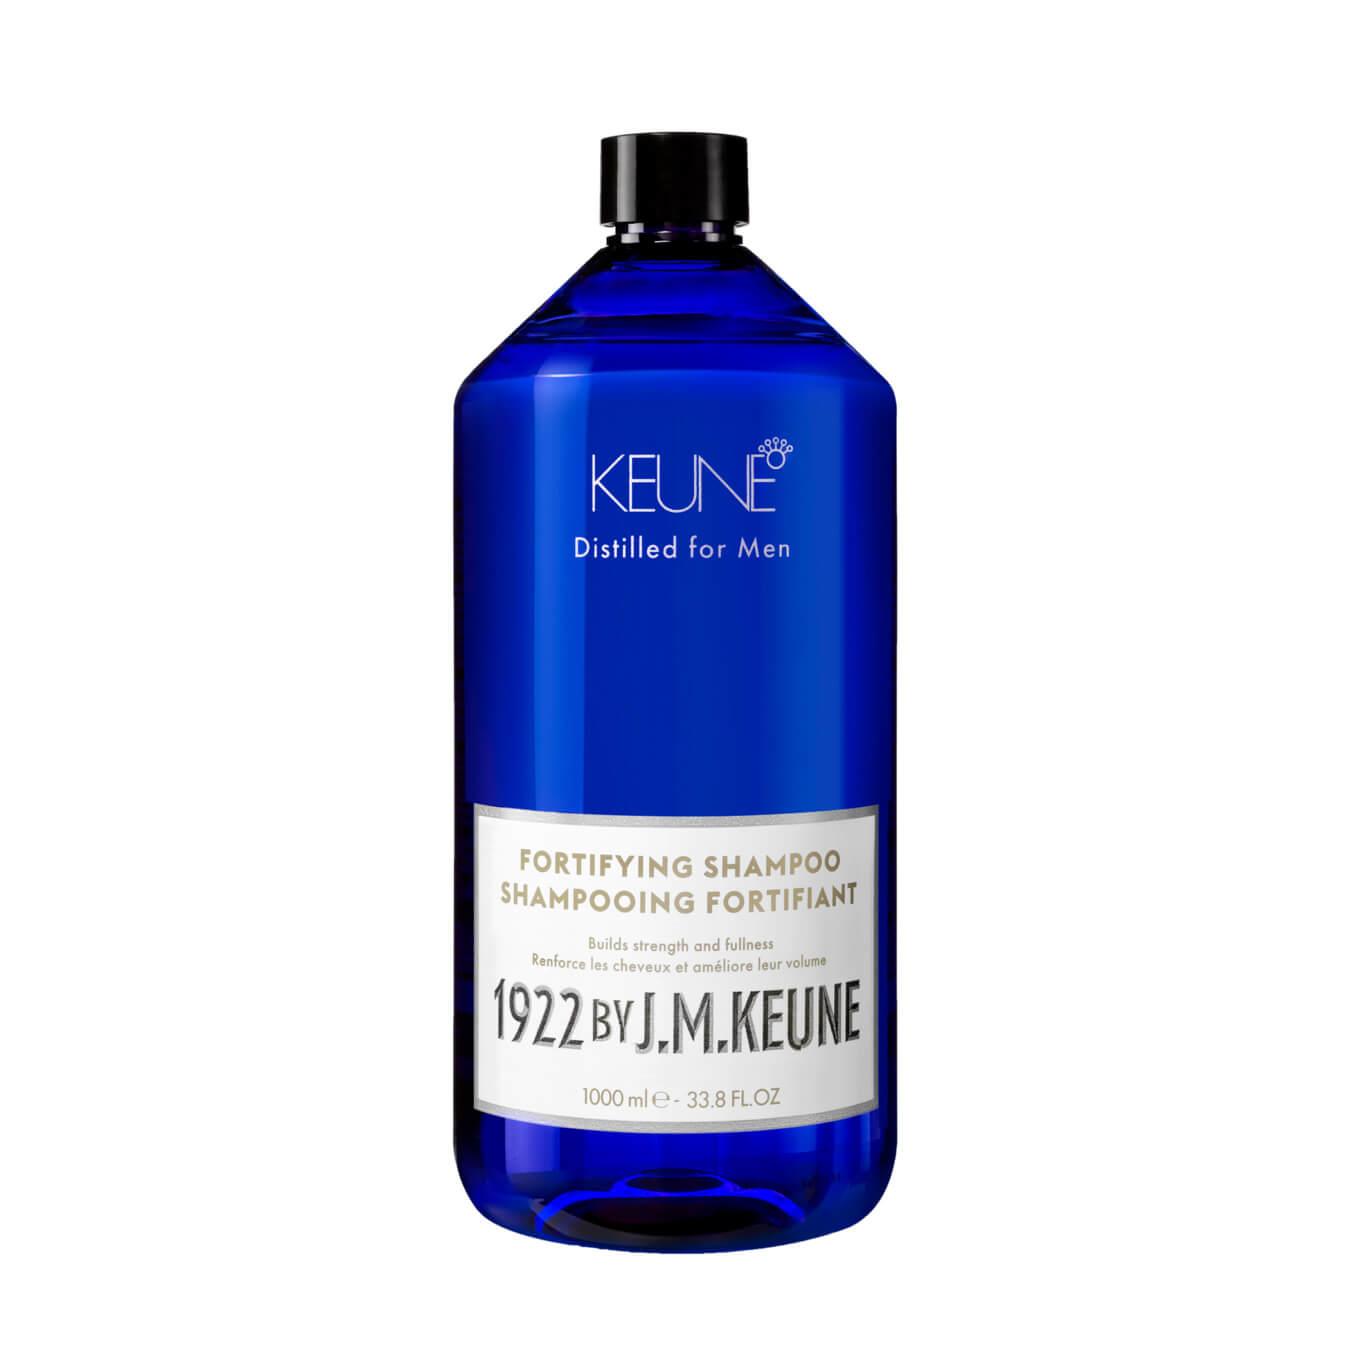 Koop 1922 By JM Keune Fortifying Shampoo 1000ml